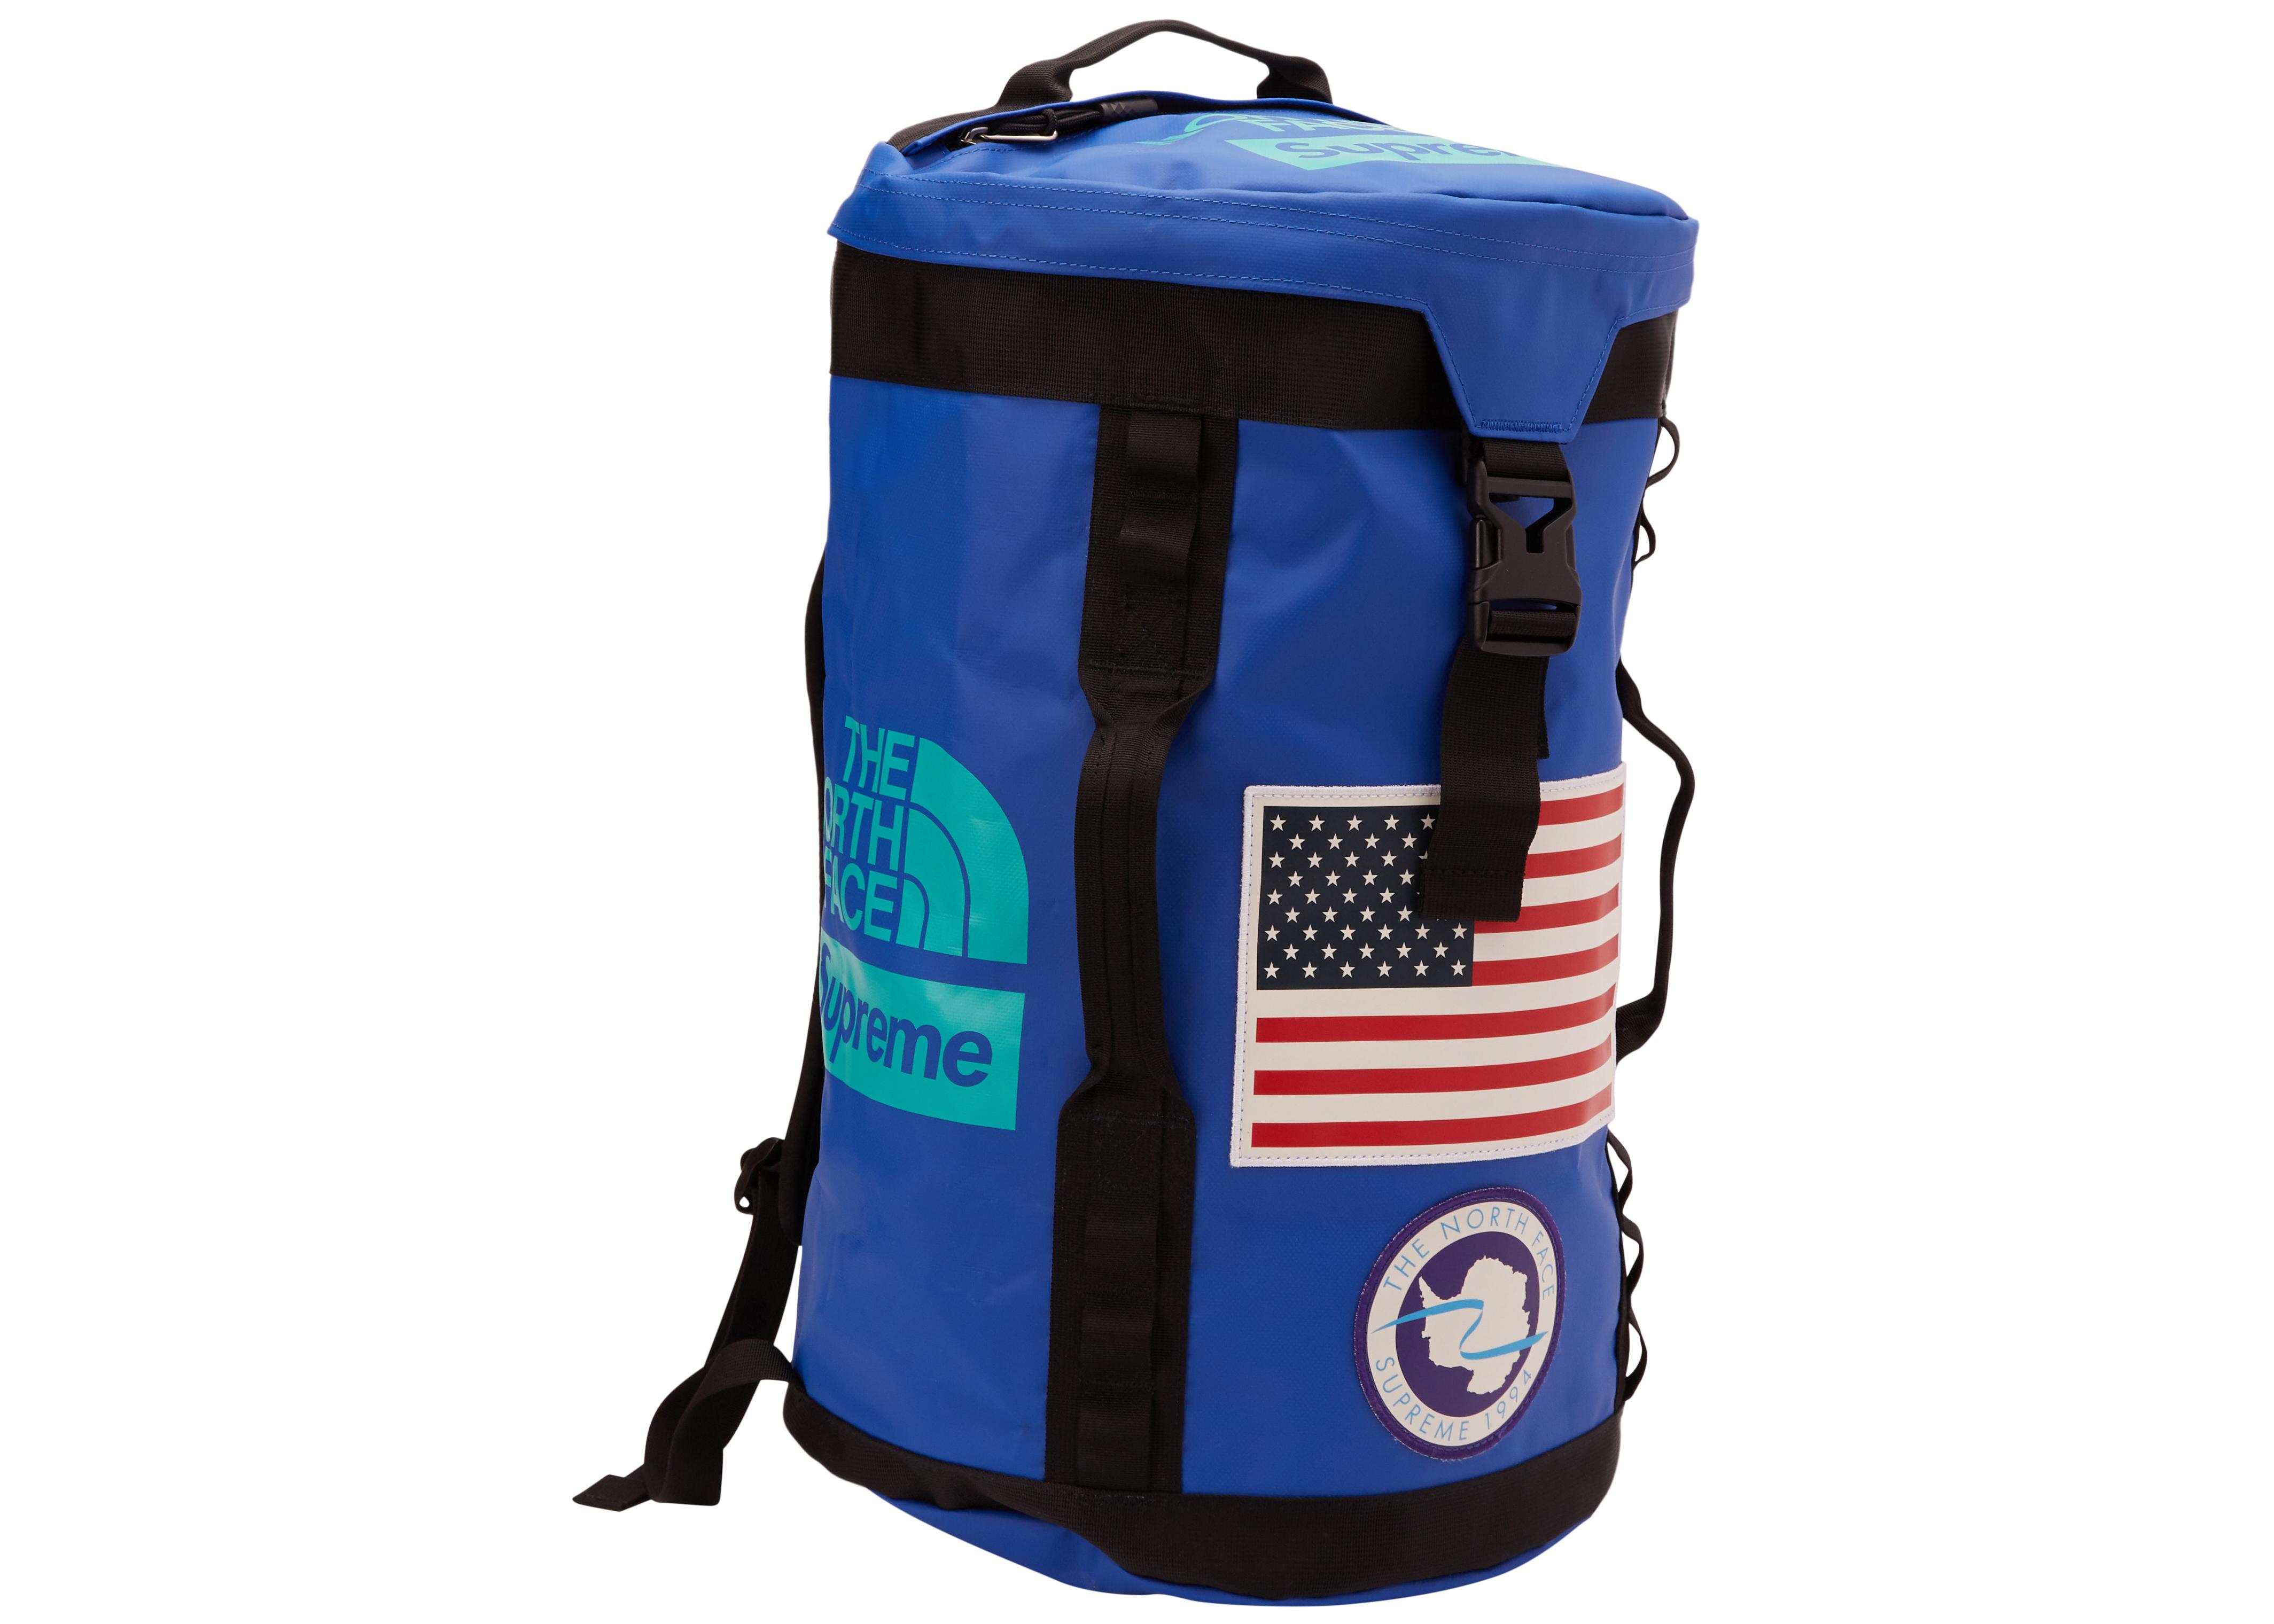 8ef7e0f25 Supreme North Face Backpack Retail Price- Fenix Toulouse Handball